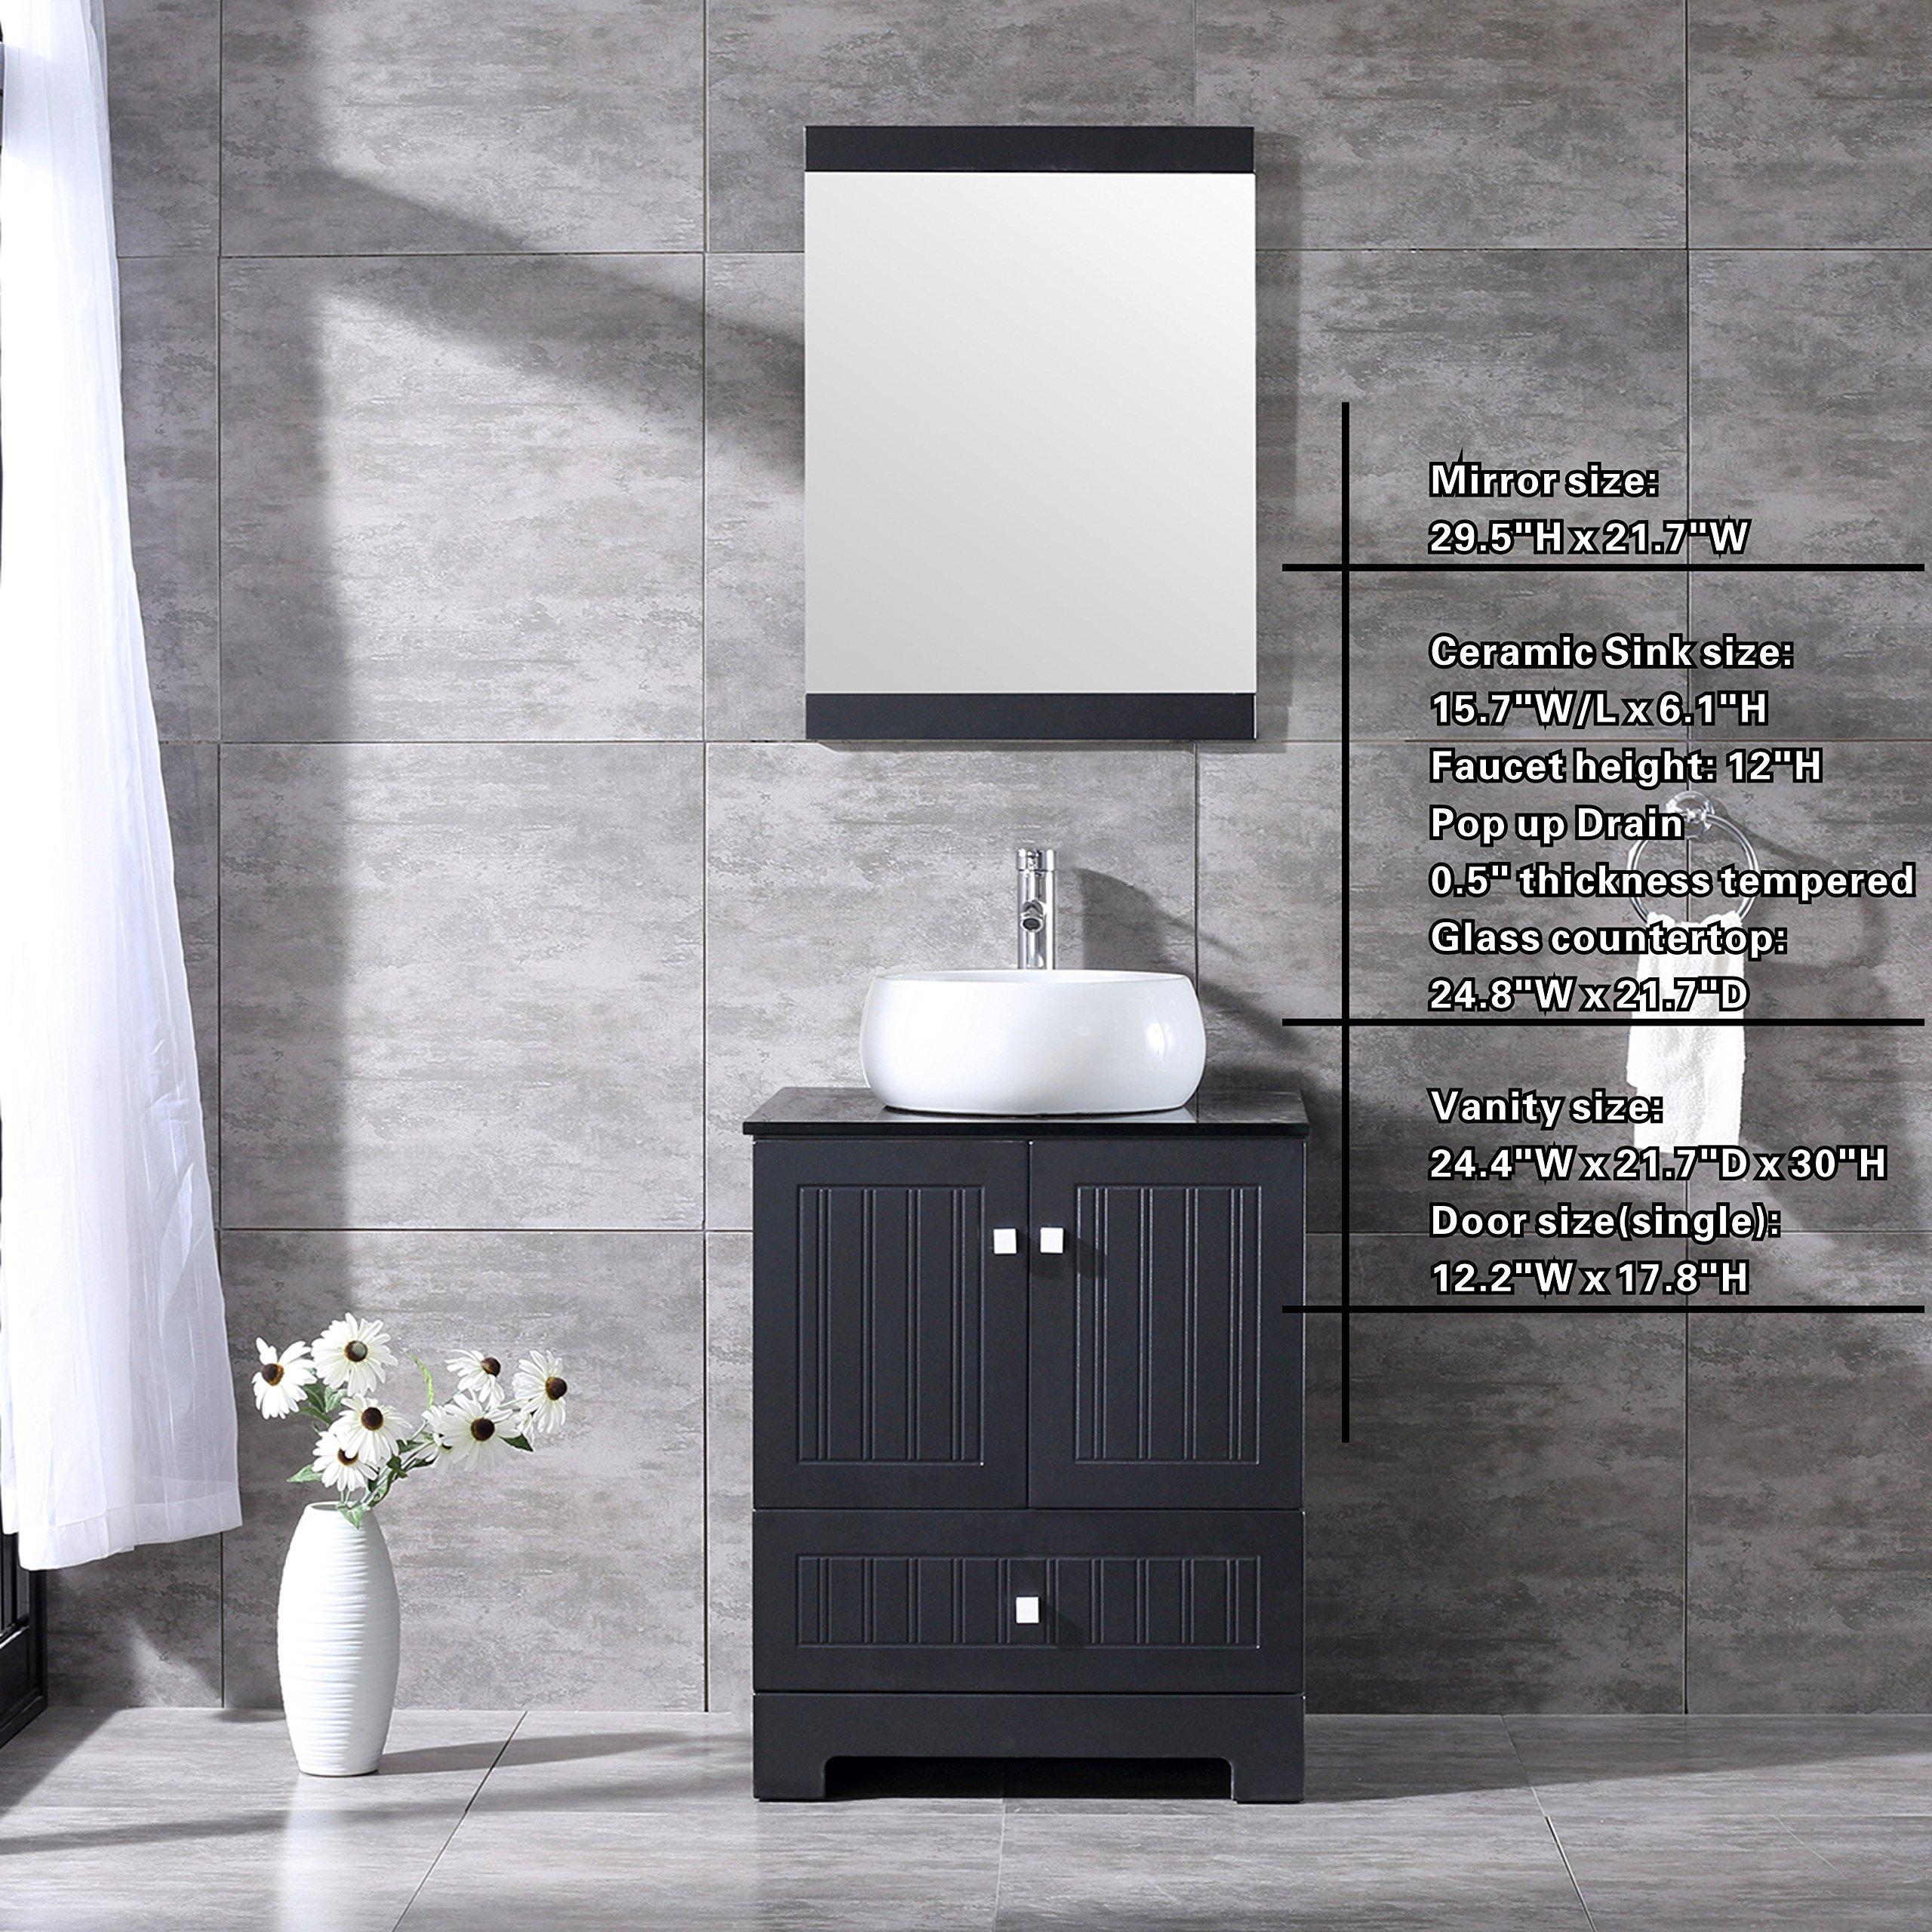 Bestmart Inc 24 Bathroom Vanity Cabinet Ceramic Vessel Round Sink Basin Faucet Mirror And Free Drain Buy Online In Aruba At Aruba Desertcart Com Productid 121833246